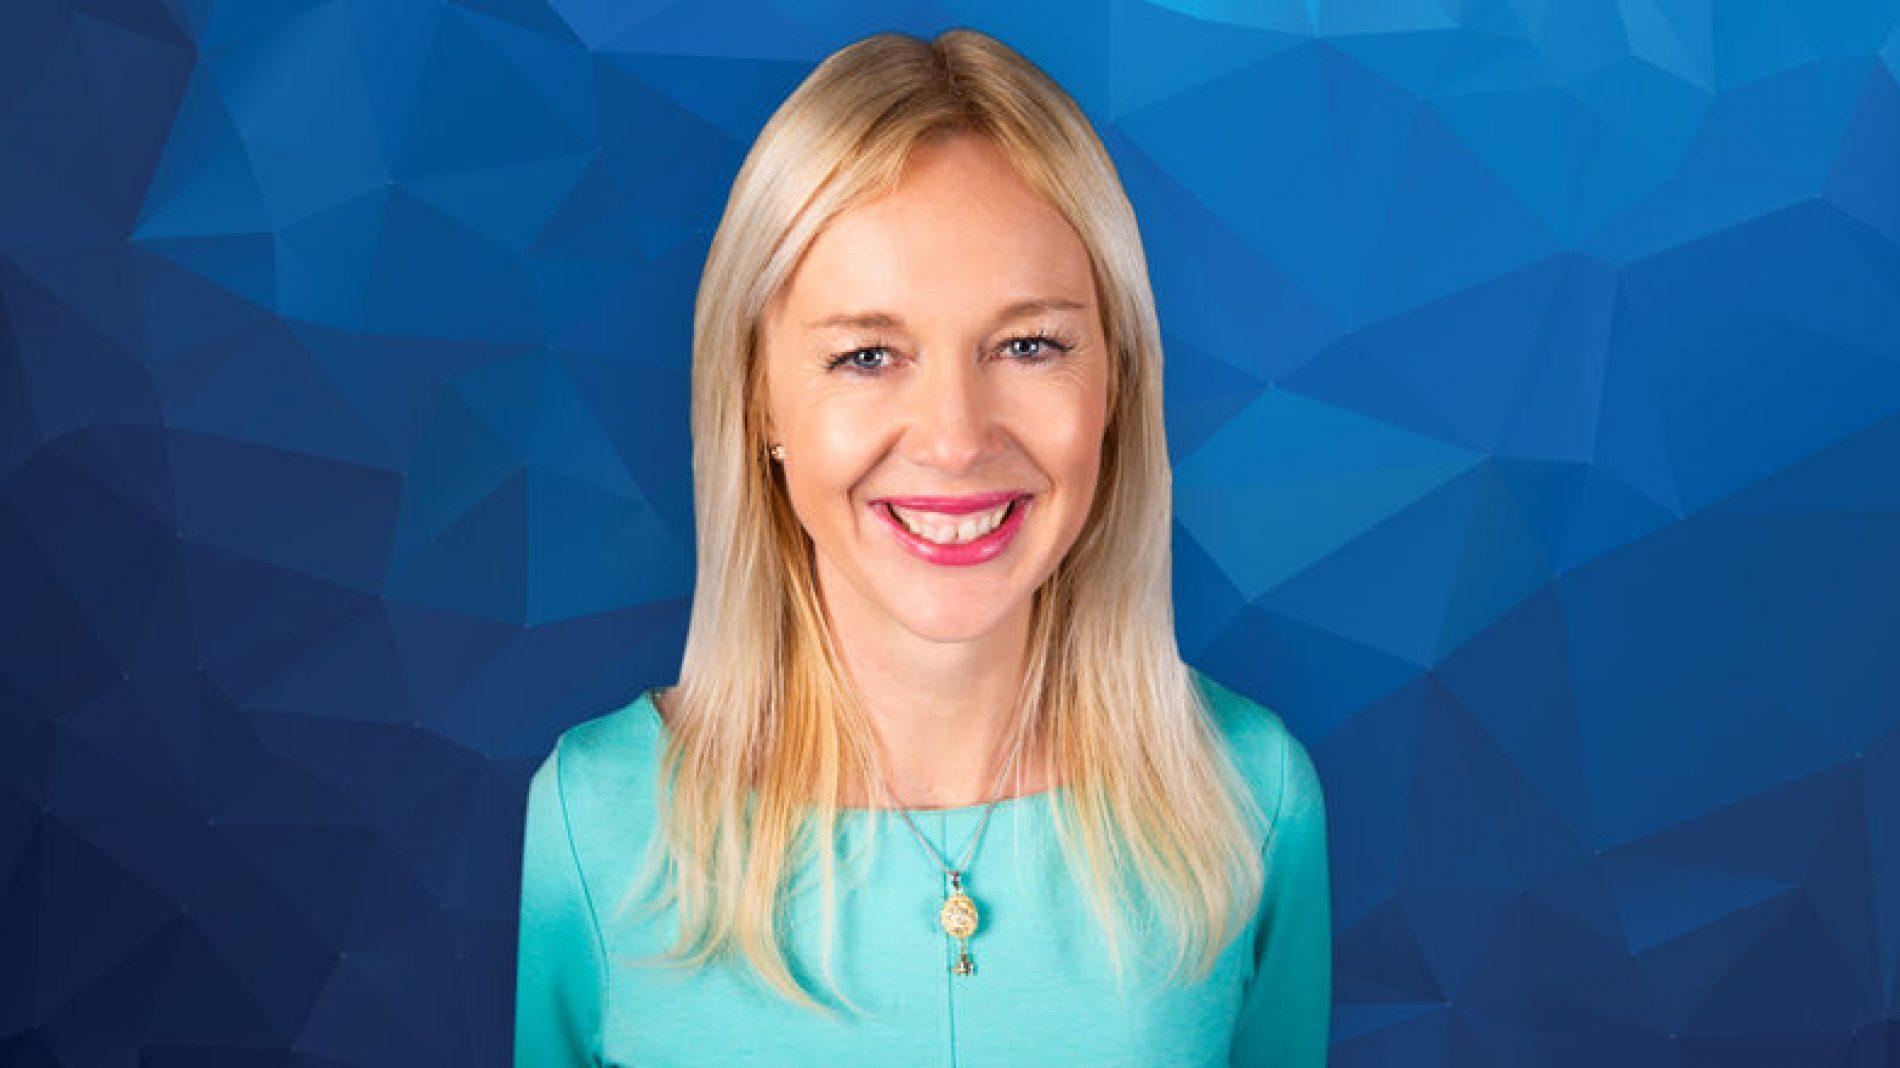 Zeminar speaker Fiona Brennan talks about the power of mindfulness